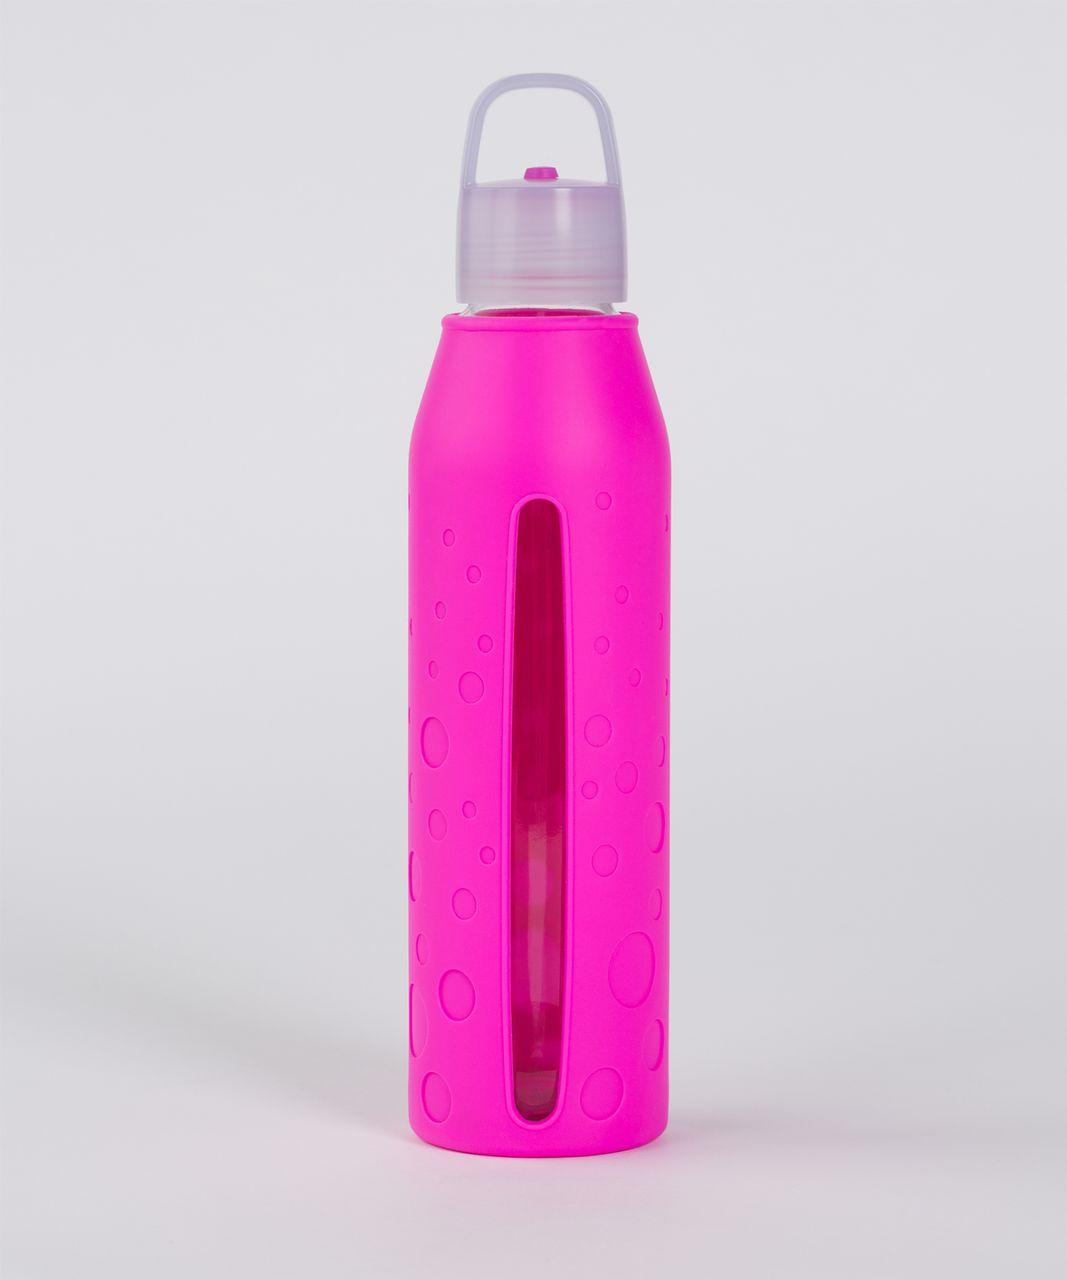 06aa613e1a Lululemon Yoga Water Bottle - Image Collections Bottle